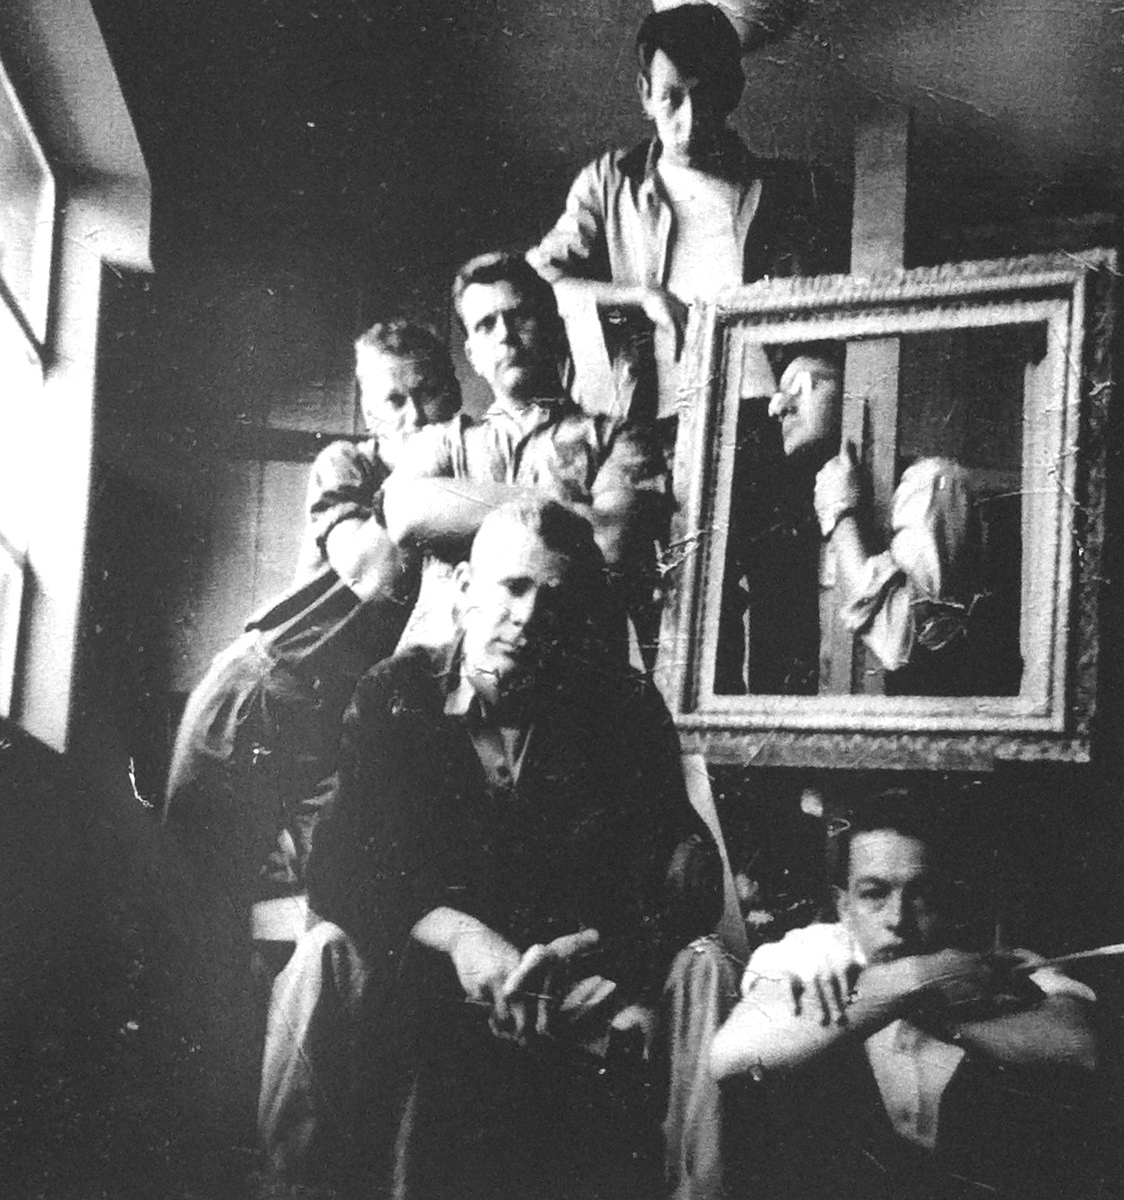 1949 Claremont Graduate School: Top-Jack Zajac, Center front-Tony DeLap, Paul Darrow